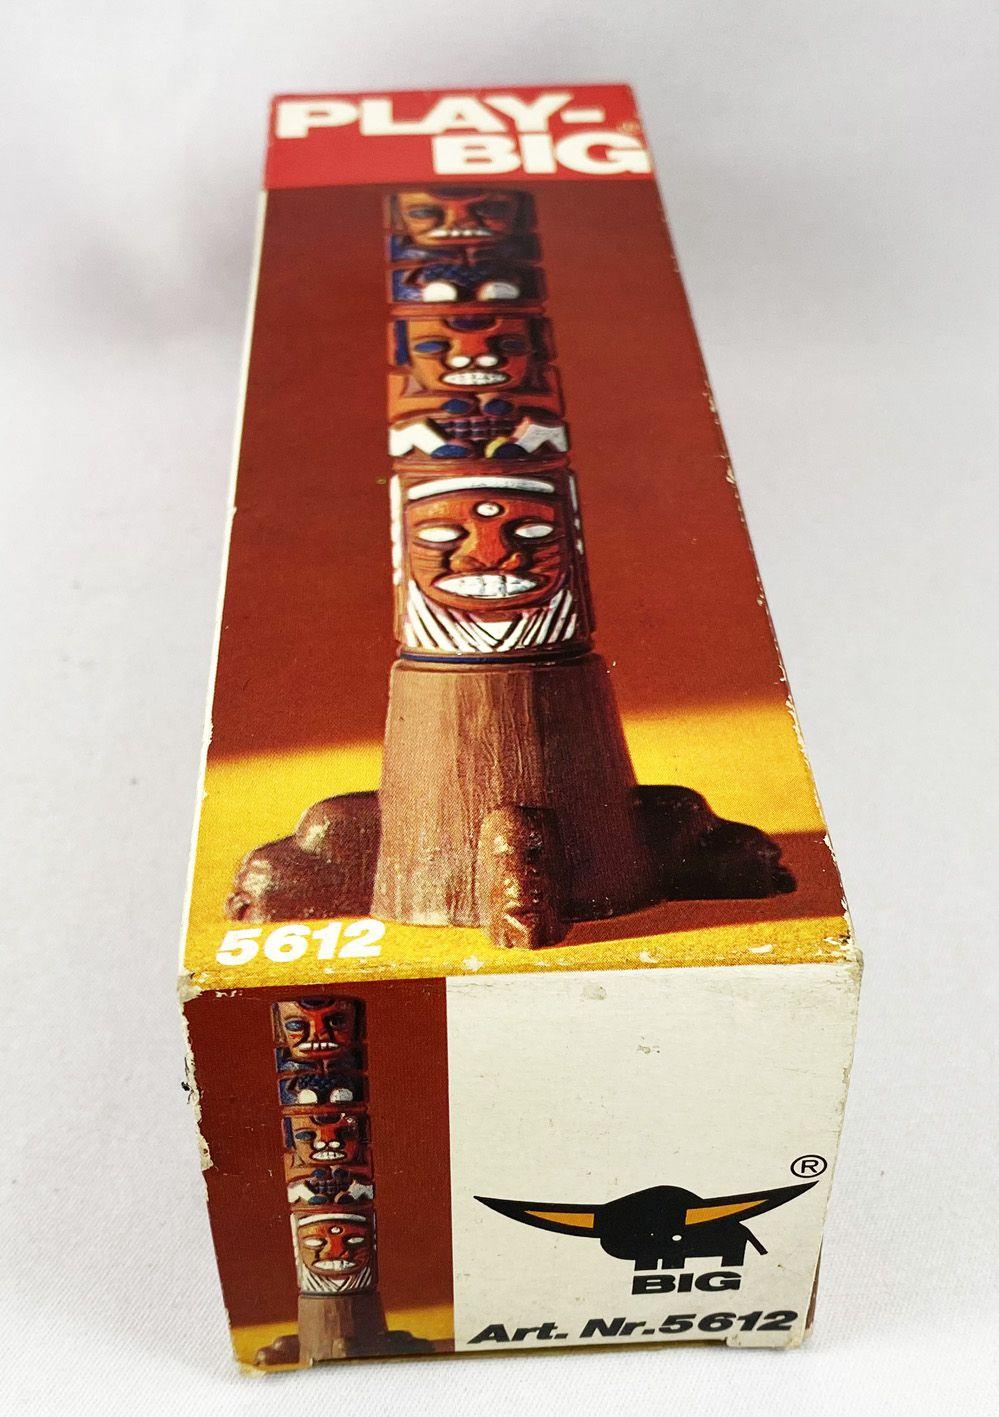 Play-Big - Ref.5612 Totem